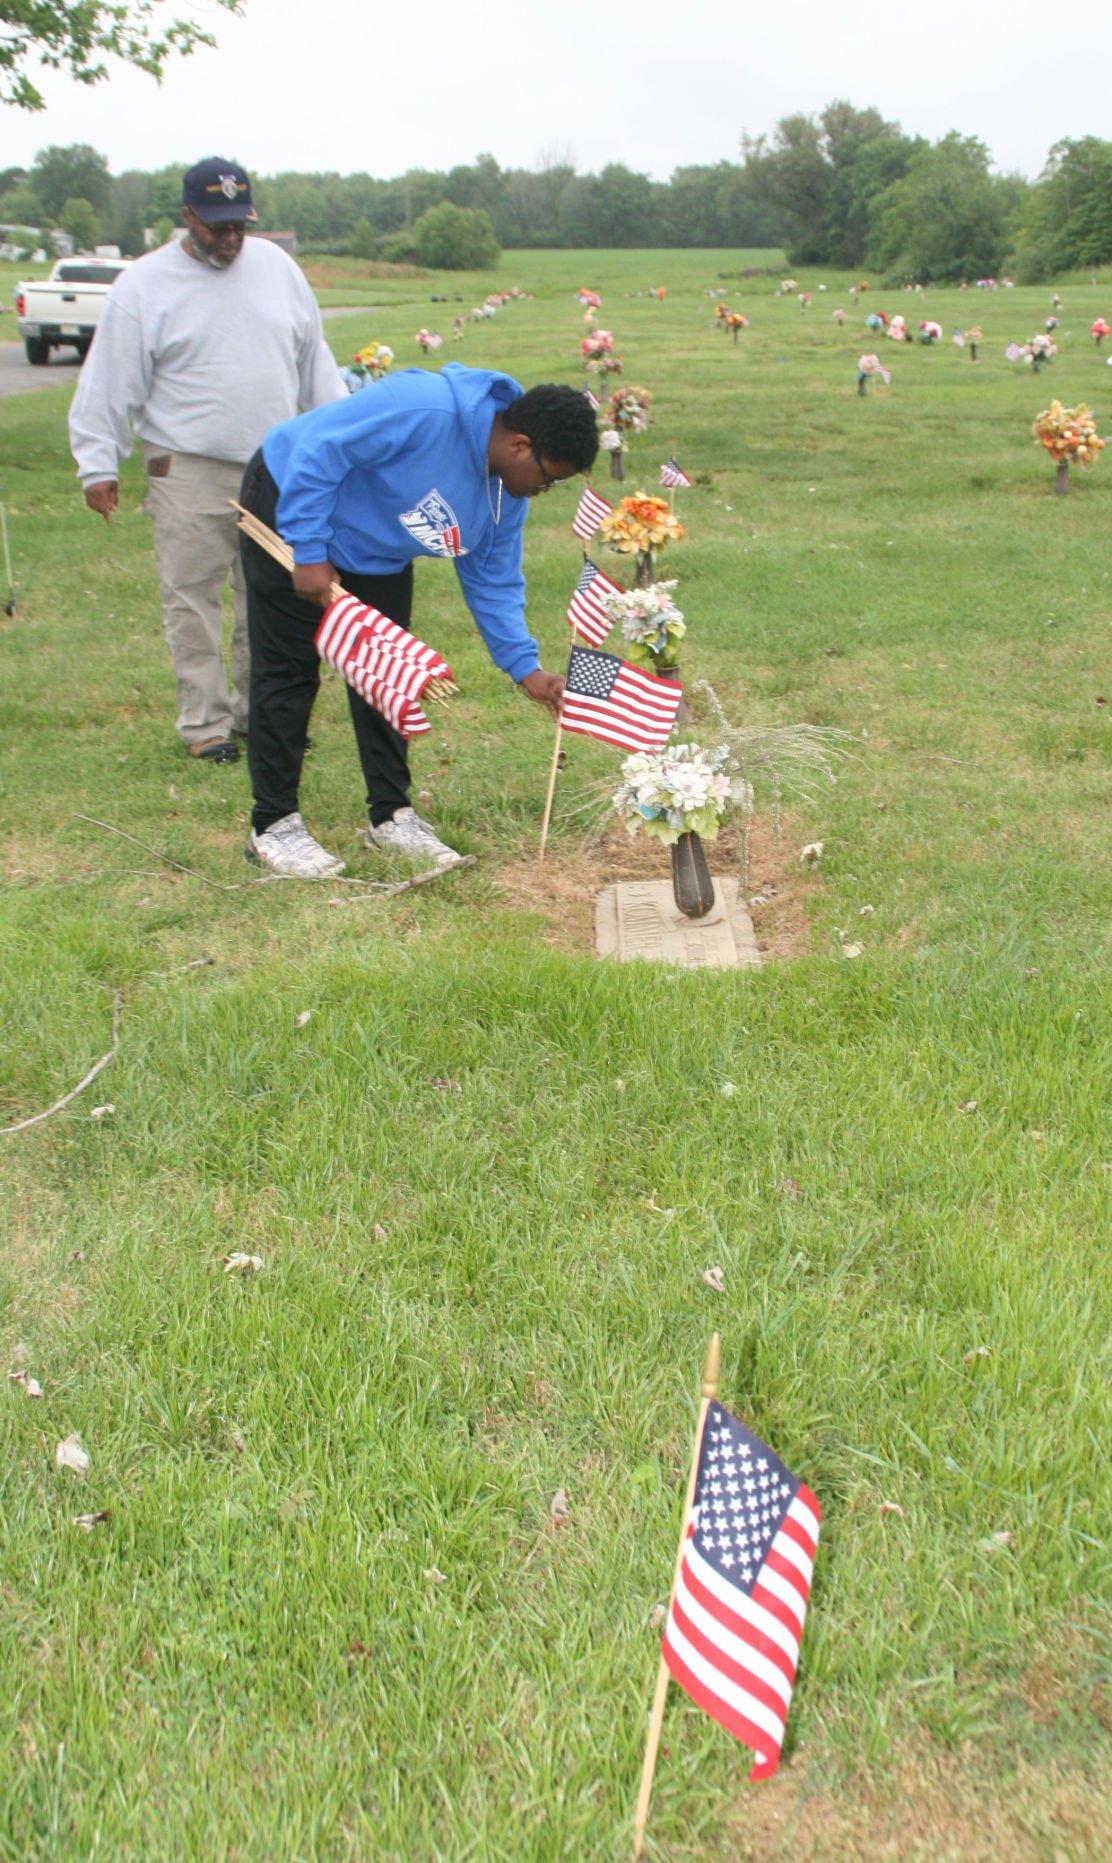 METNWS-06-03-21 MEMORIAL DAY OBSERVANCES_PHOTO 1